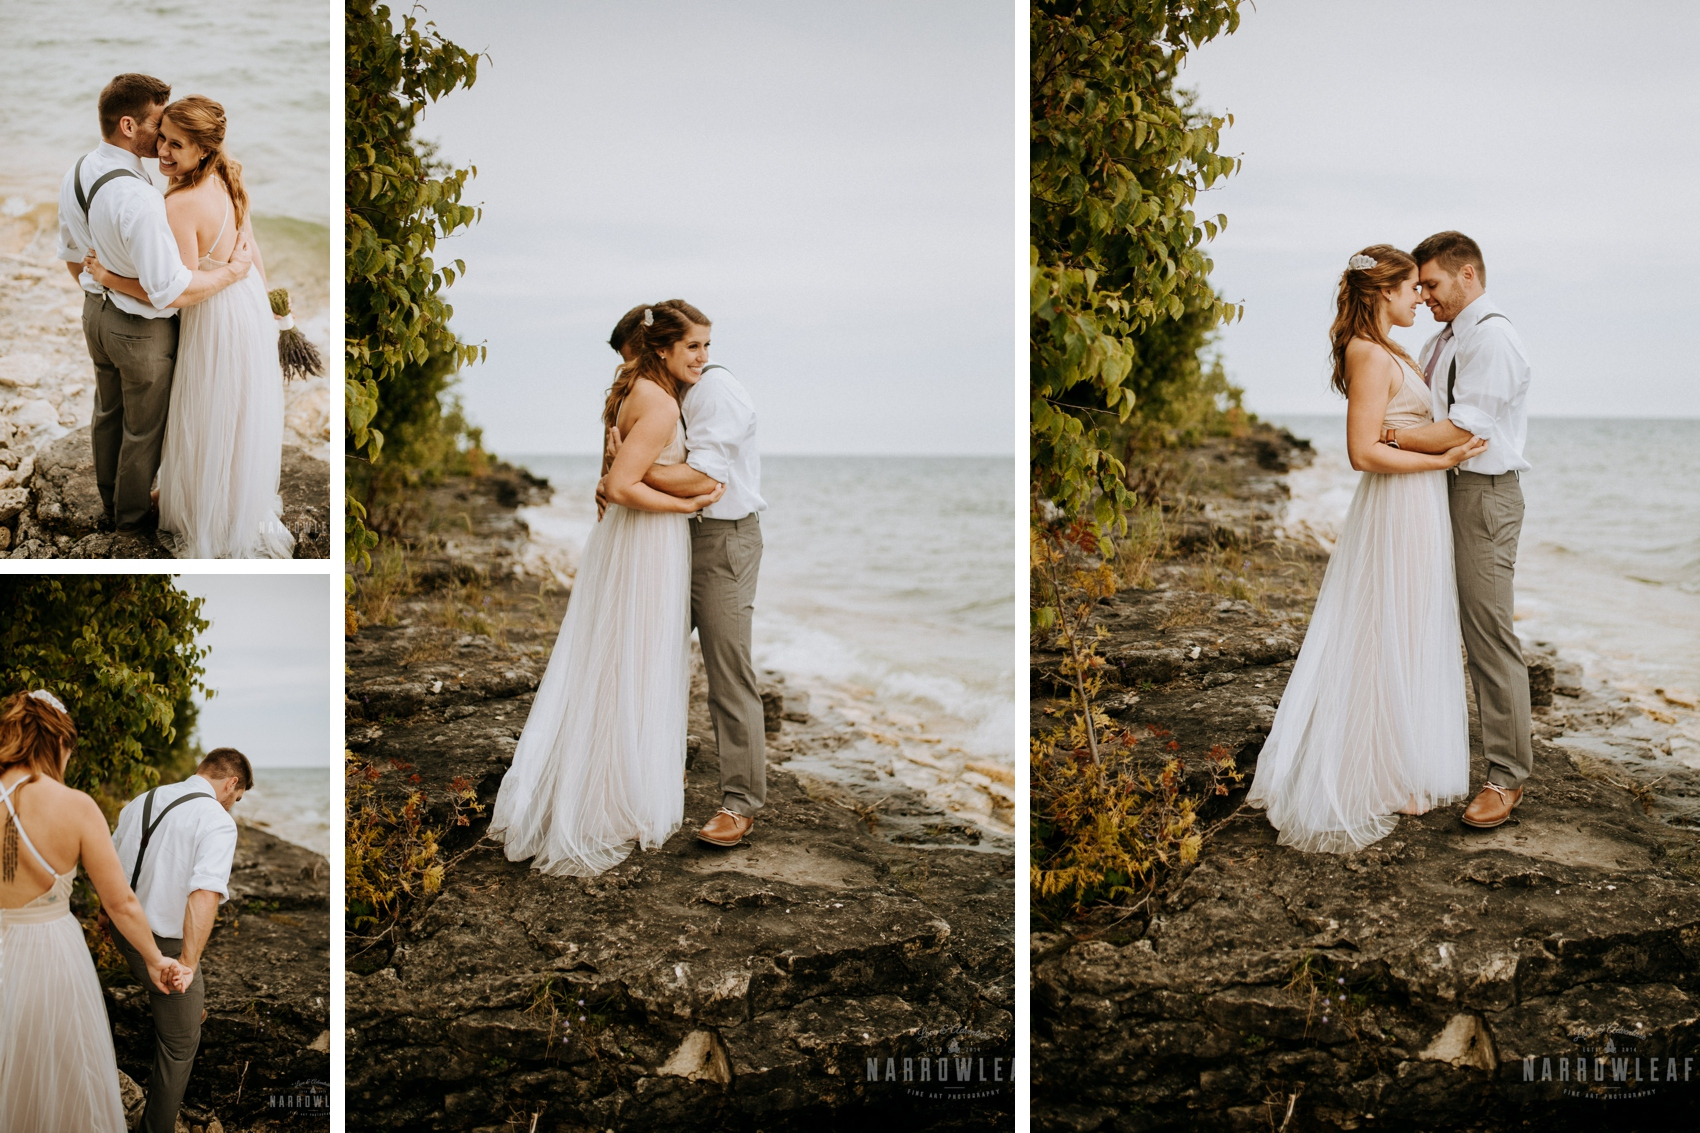 wisconsin-wedding-photographer-woodsy-narrowleaf-photography019-020.jpg